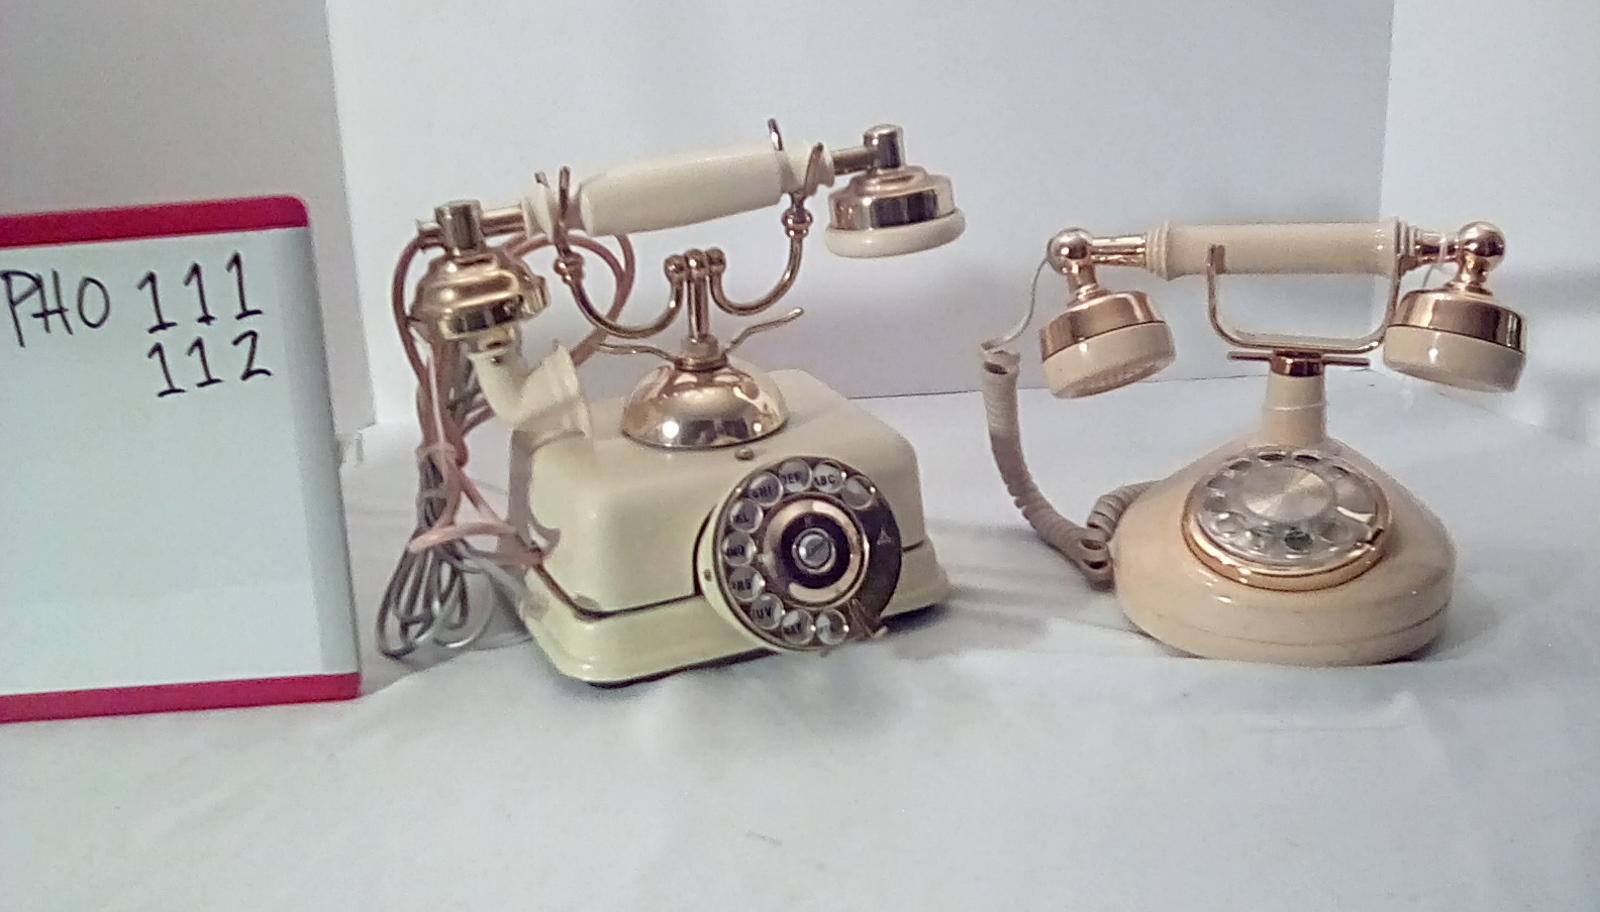 PHO111 beige square base rotary princess desk phone,  PHO112 Beige rotary princess desk phone